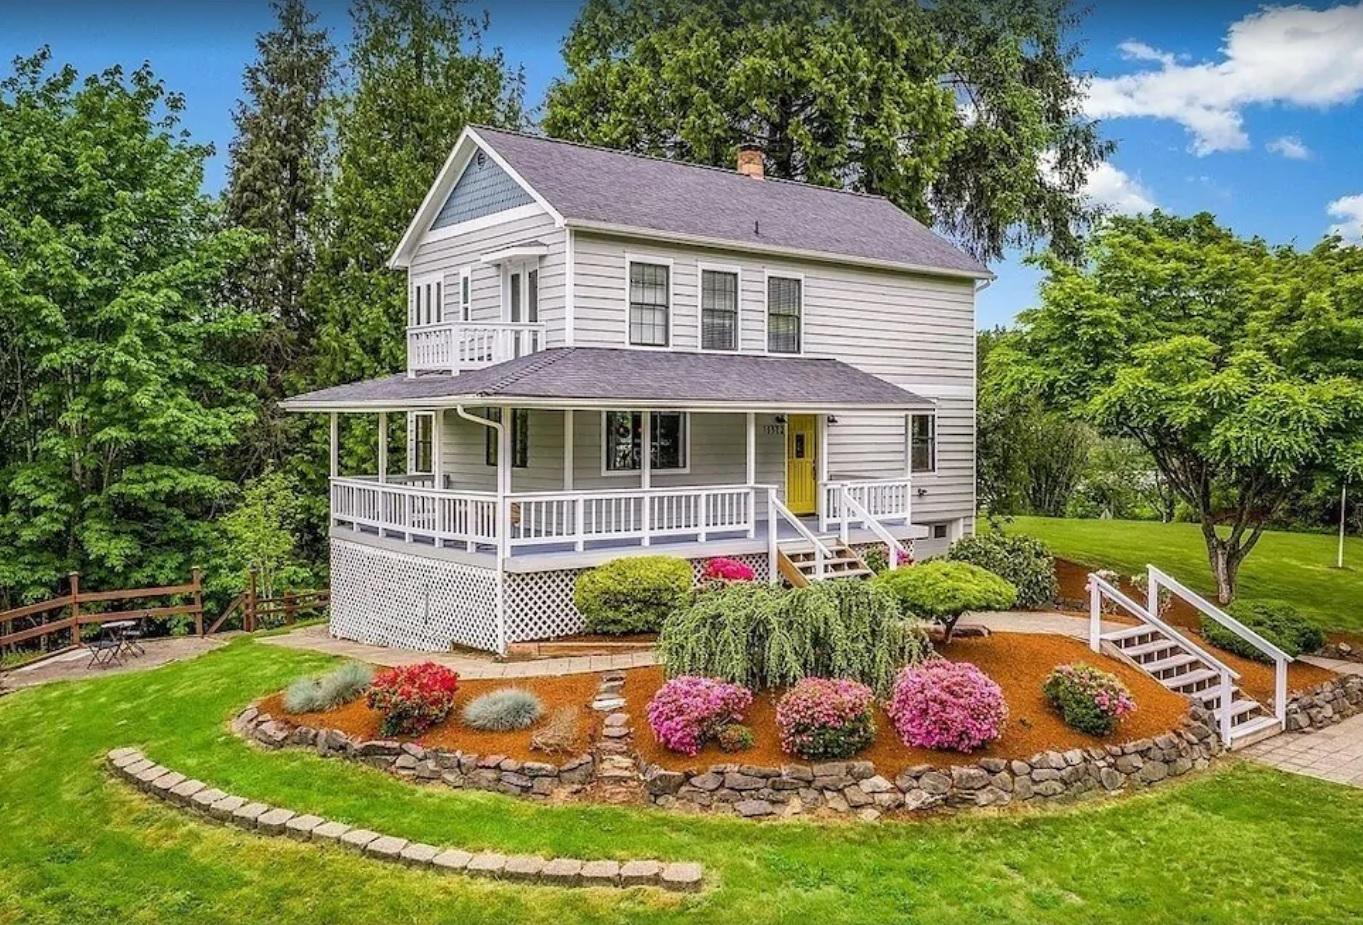 Creekside Farmhouse Retreat & Vacations